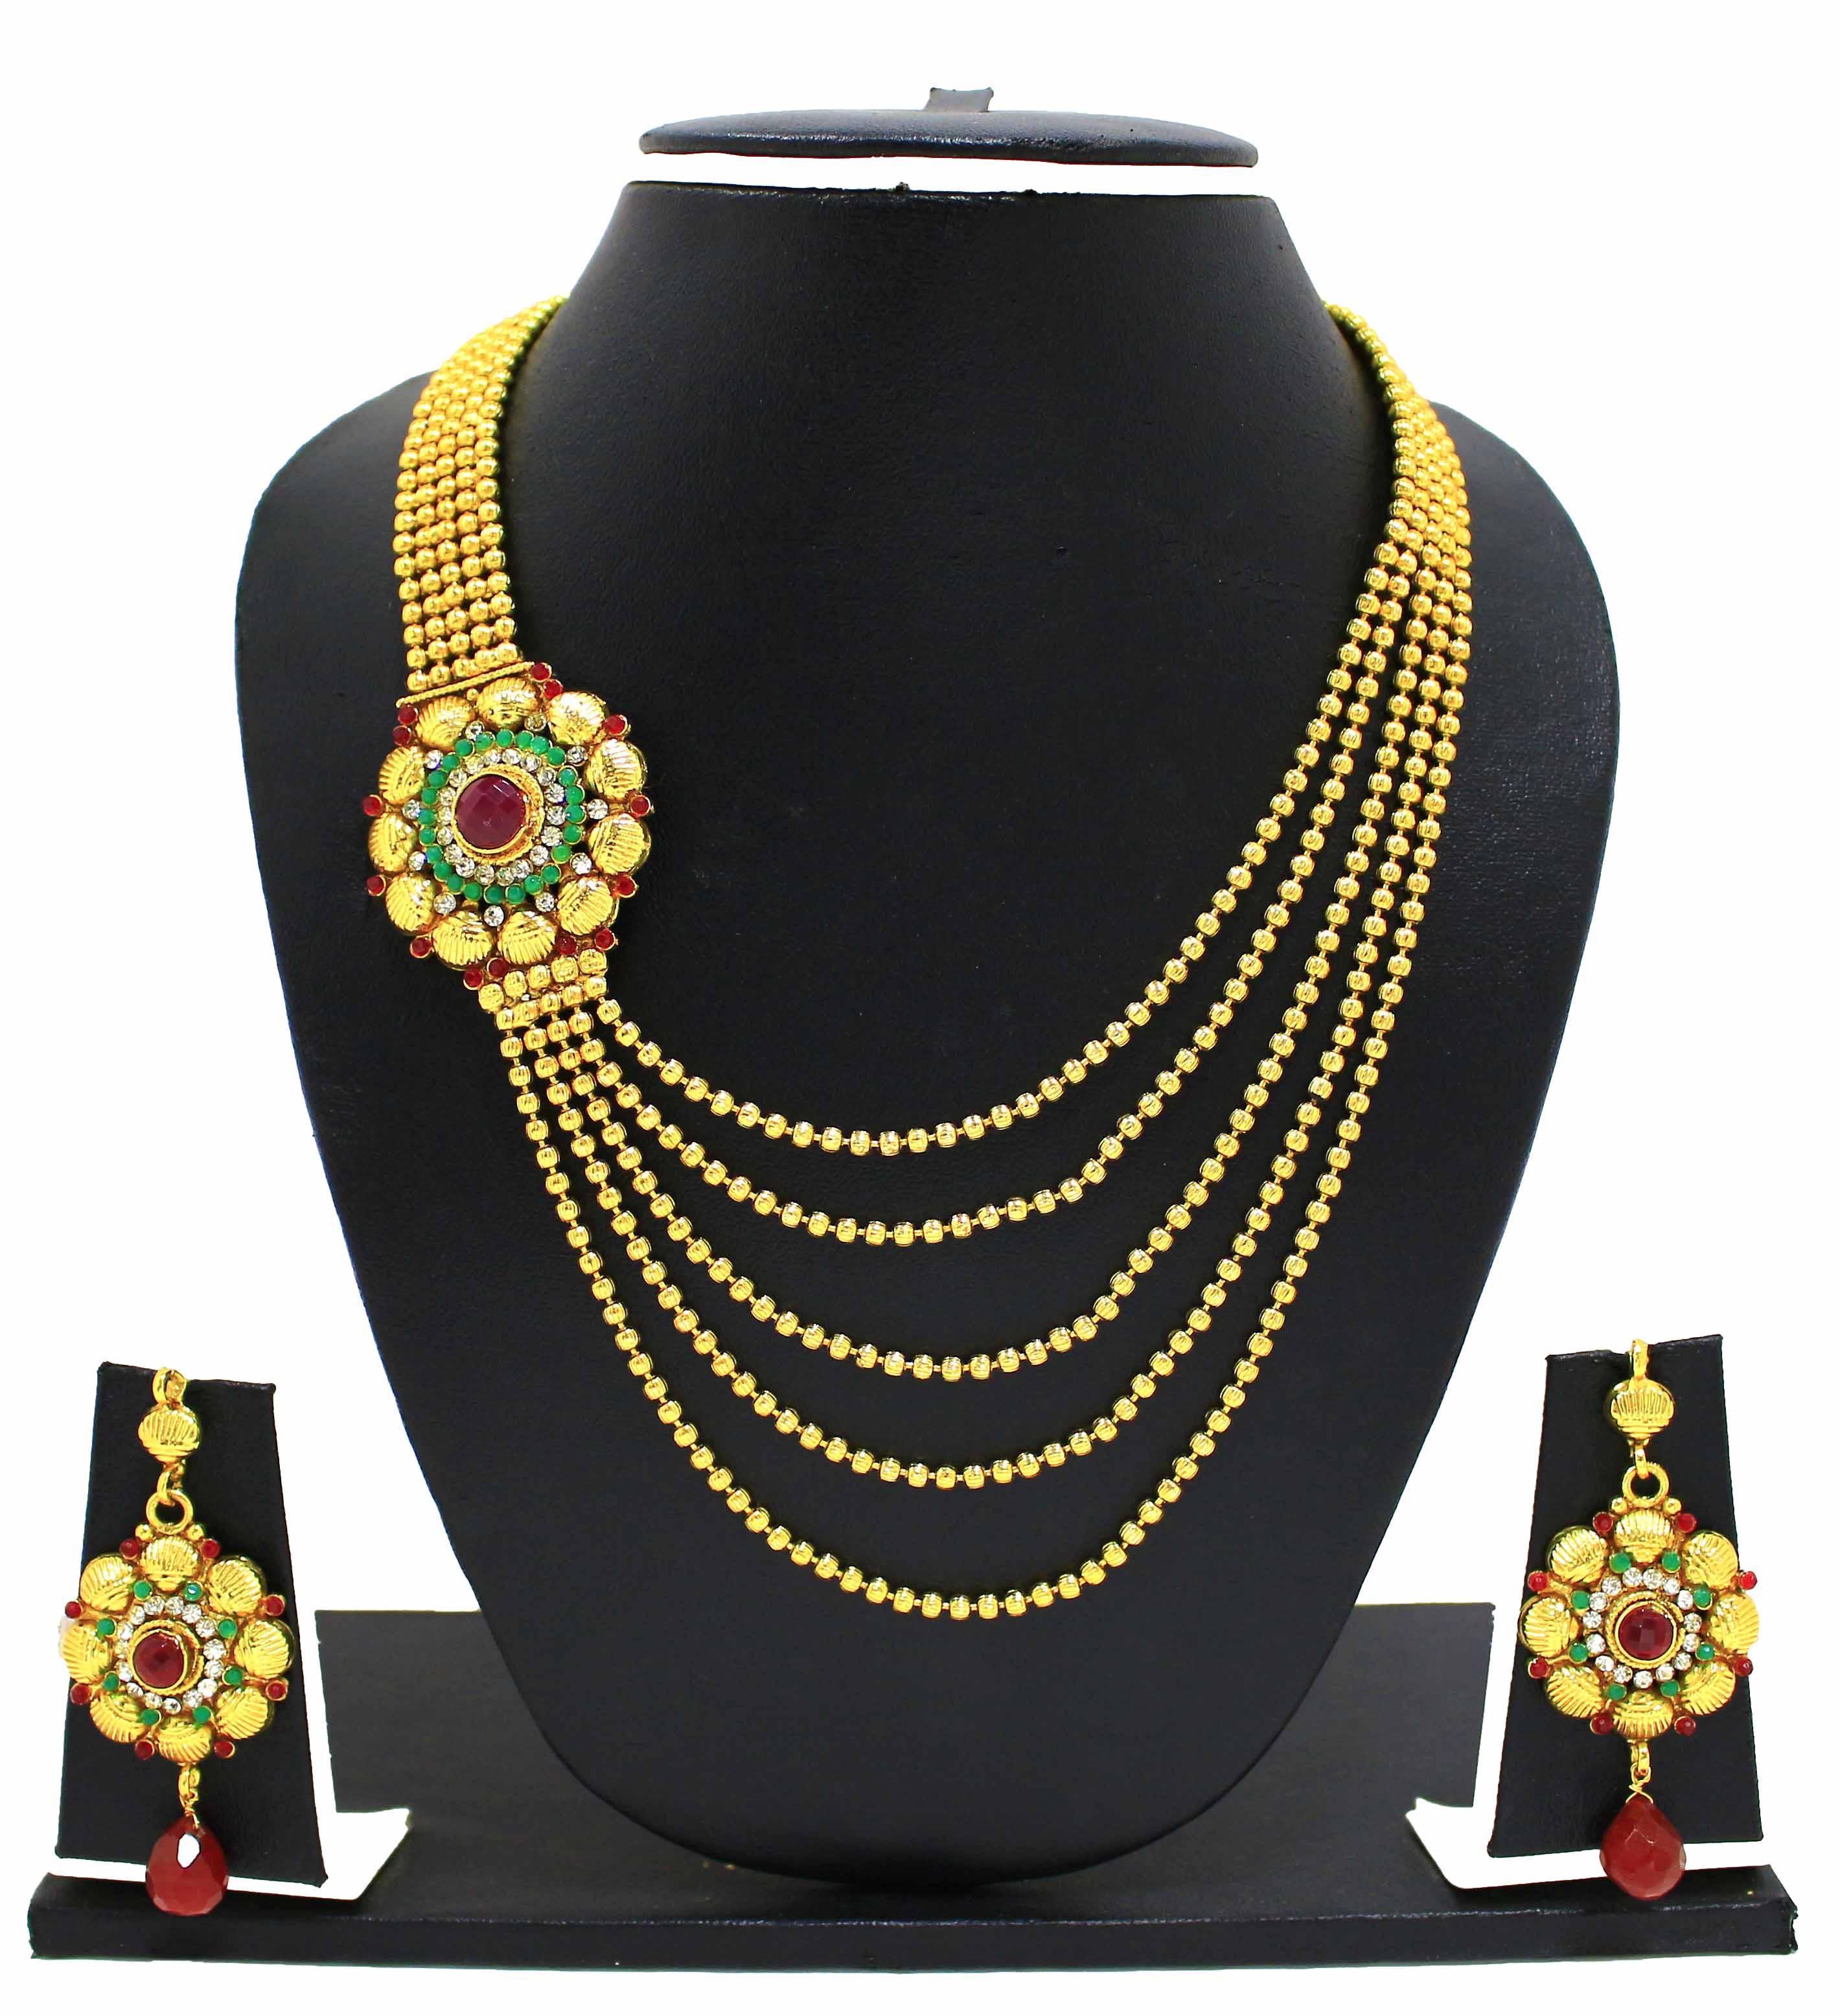 Deals - Delhi - Top trends <br> Earrings, jewellery Sets, Rings...<br> Category - jewellery<br> Business - Flipkart.com